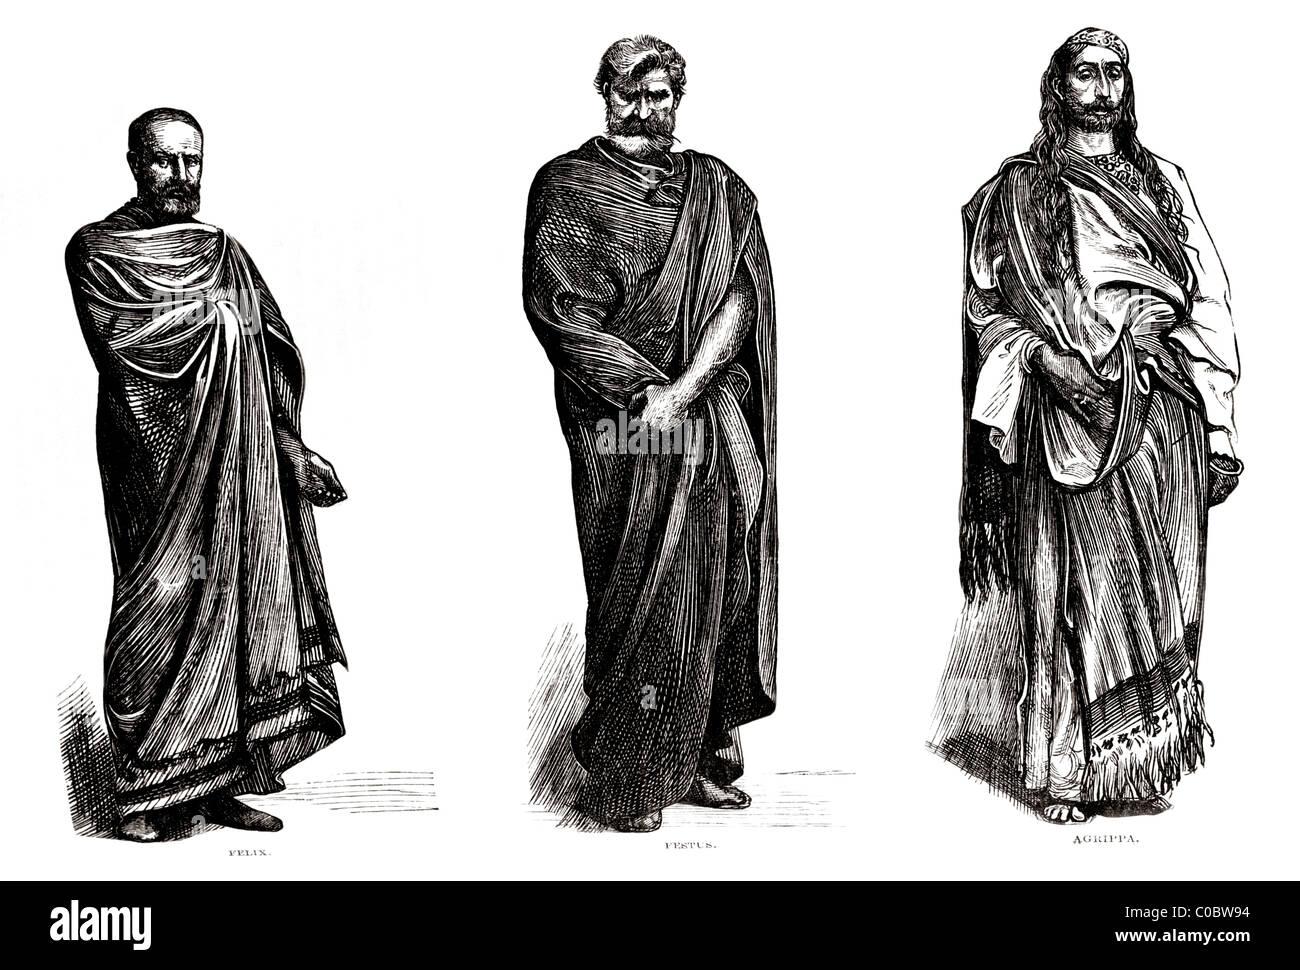 Paul's Judges Felix Festus & Agrippa (left To Right) Bible Story - Stock Image